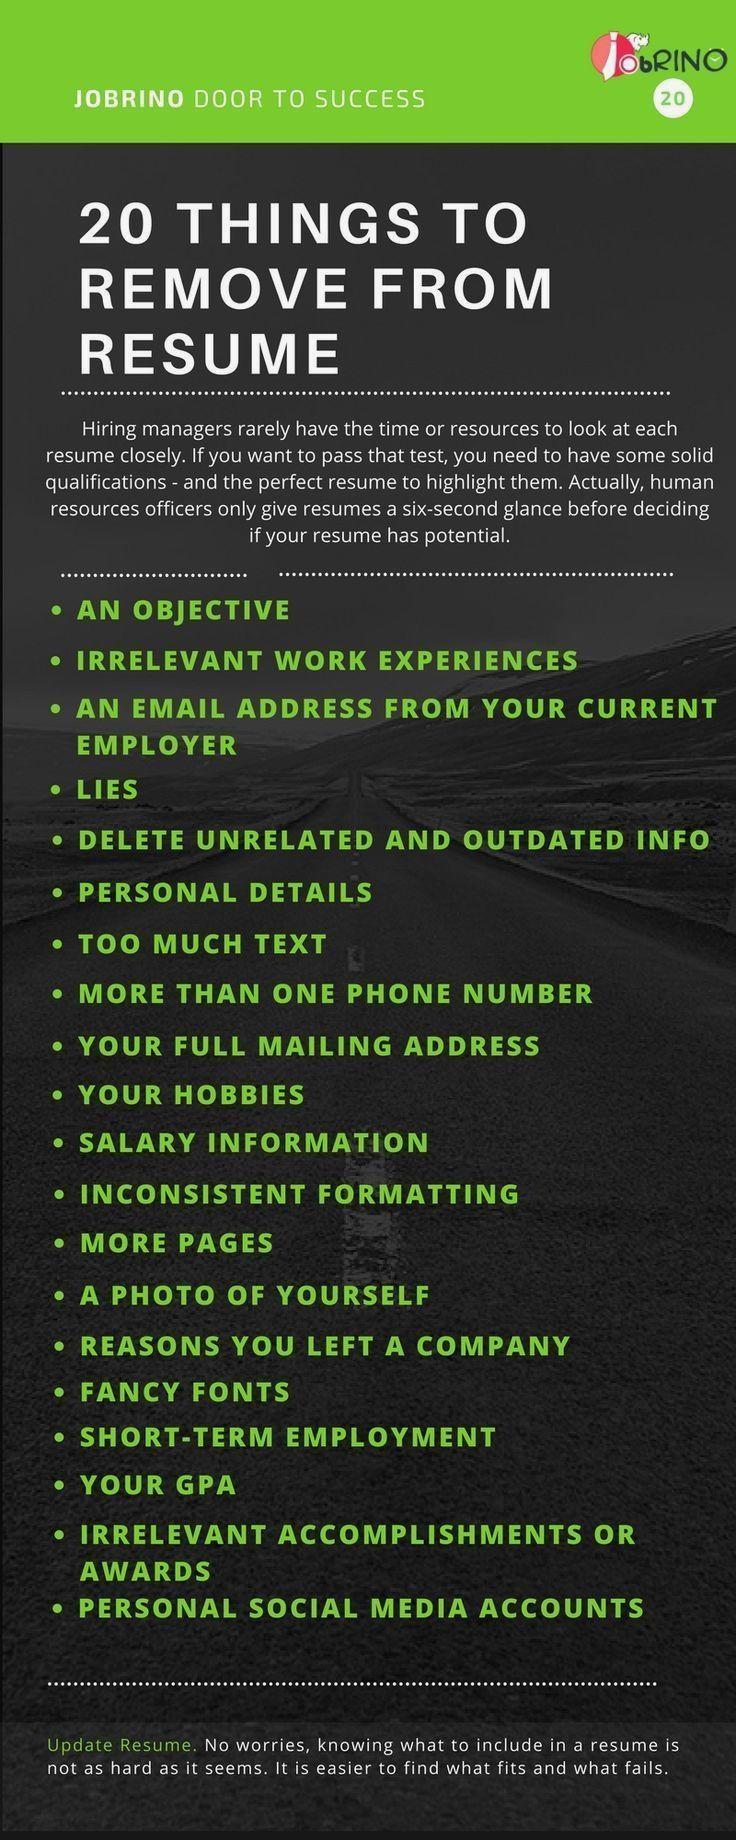 Resume tips to nail that job interview job resume